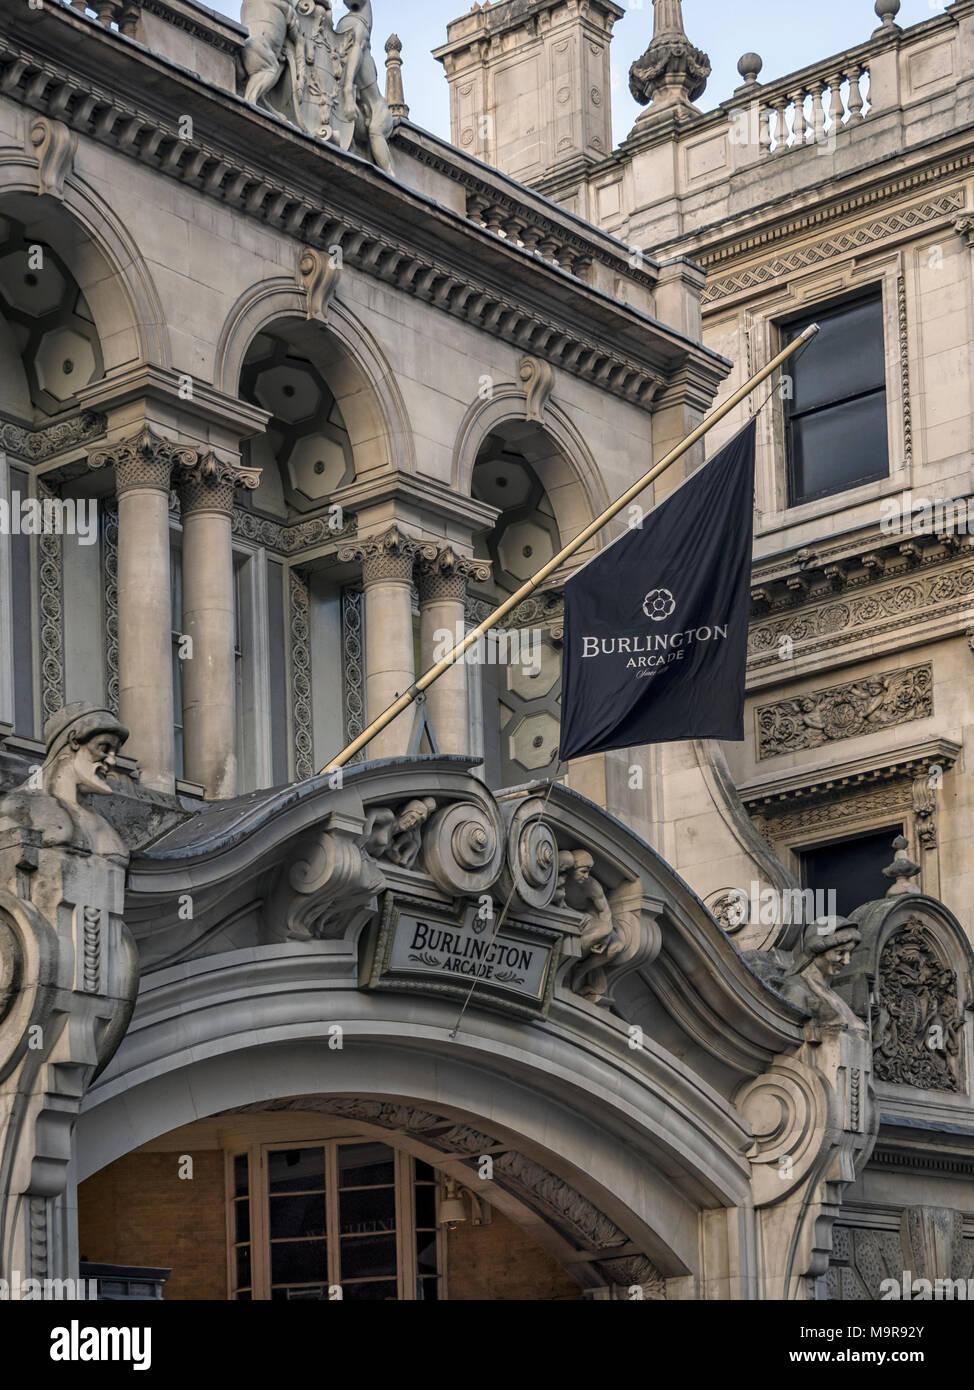 BURLINGTON ARCADE, LONDON:  Banner sign above entrance - Stock Image